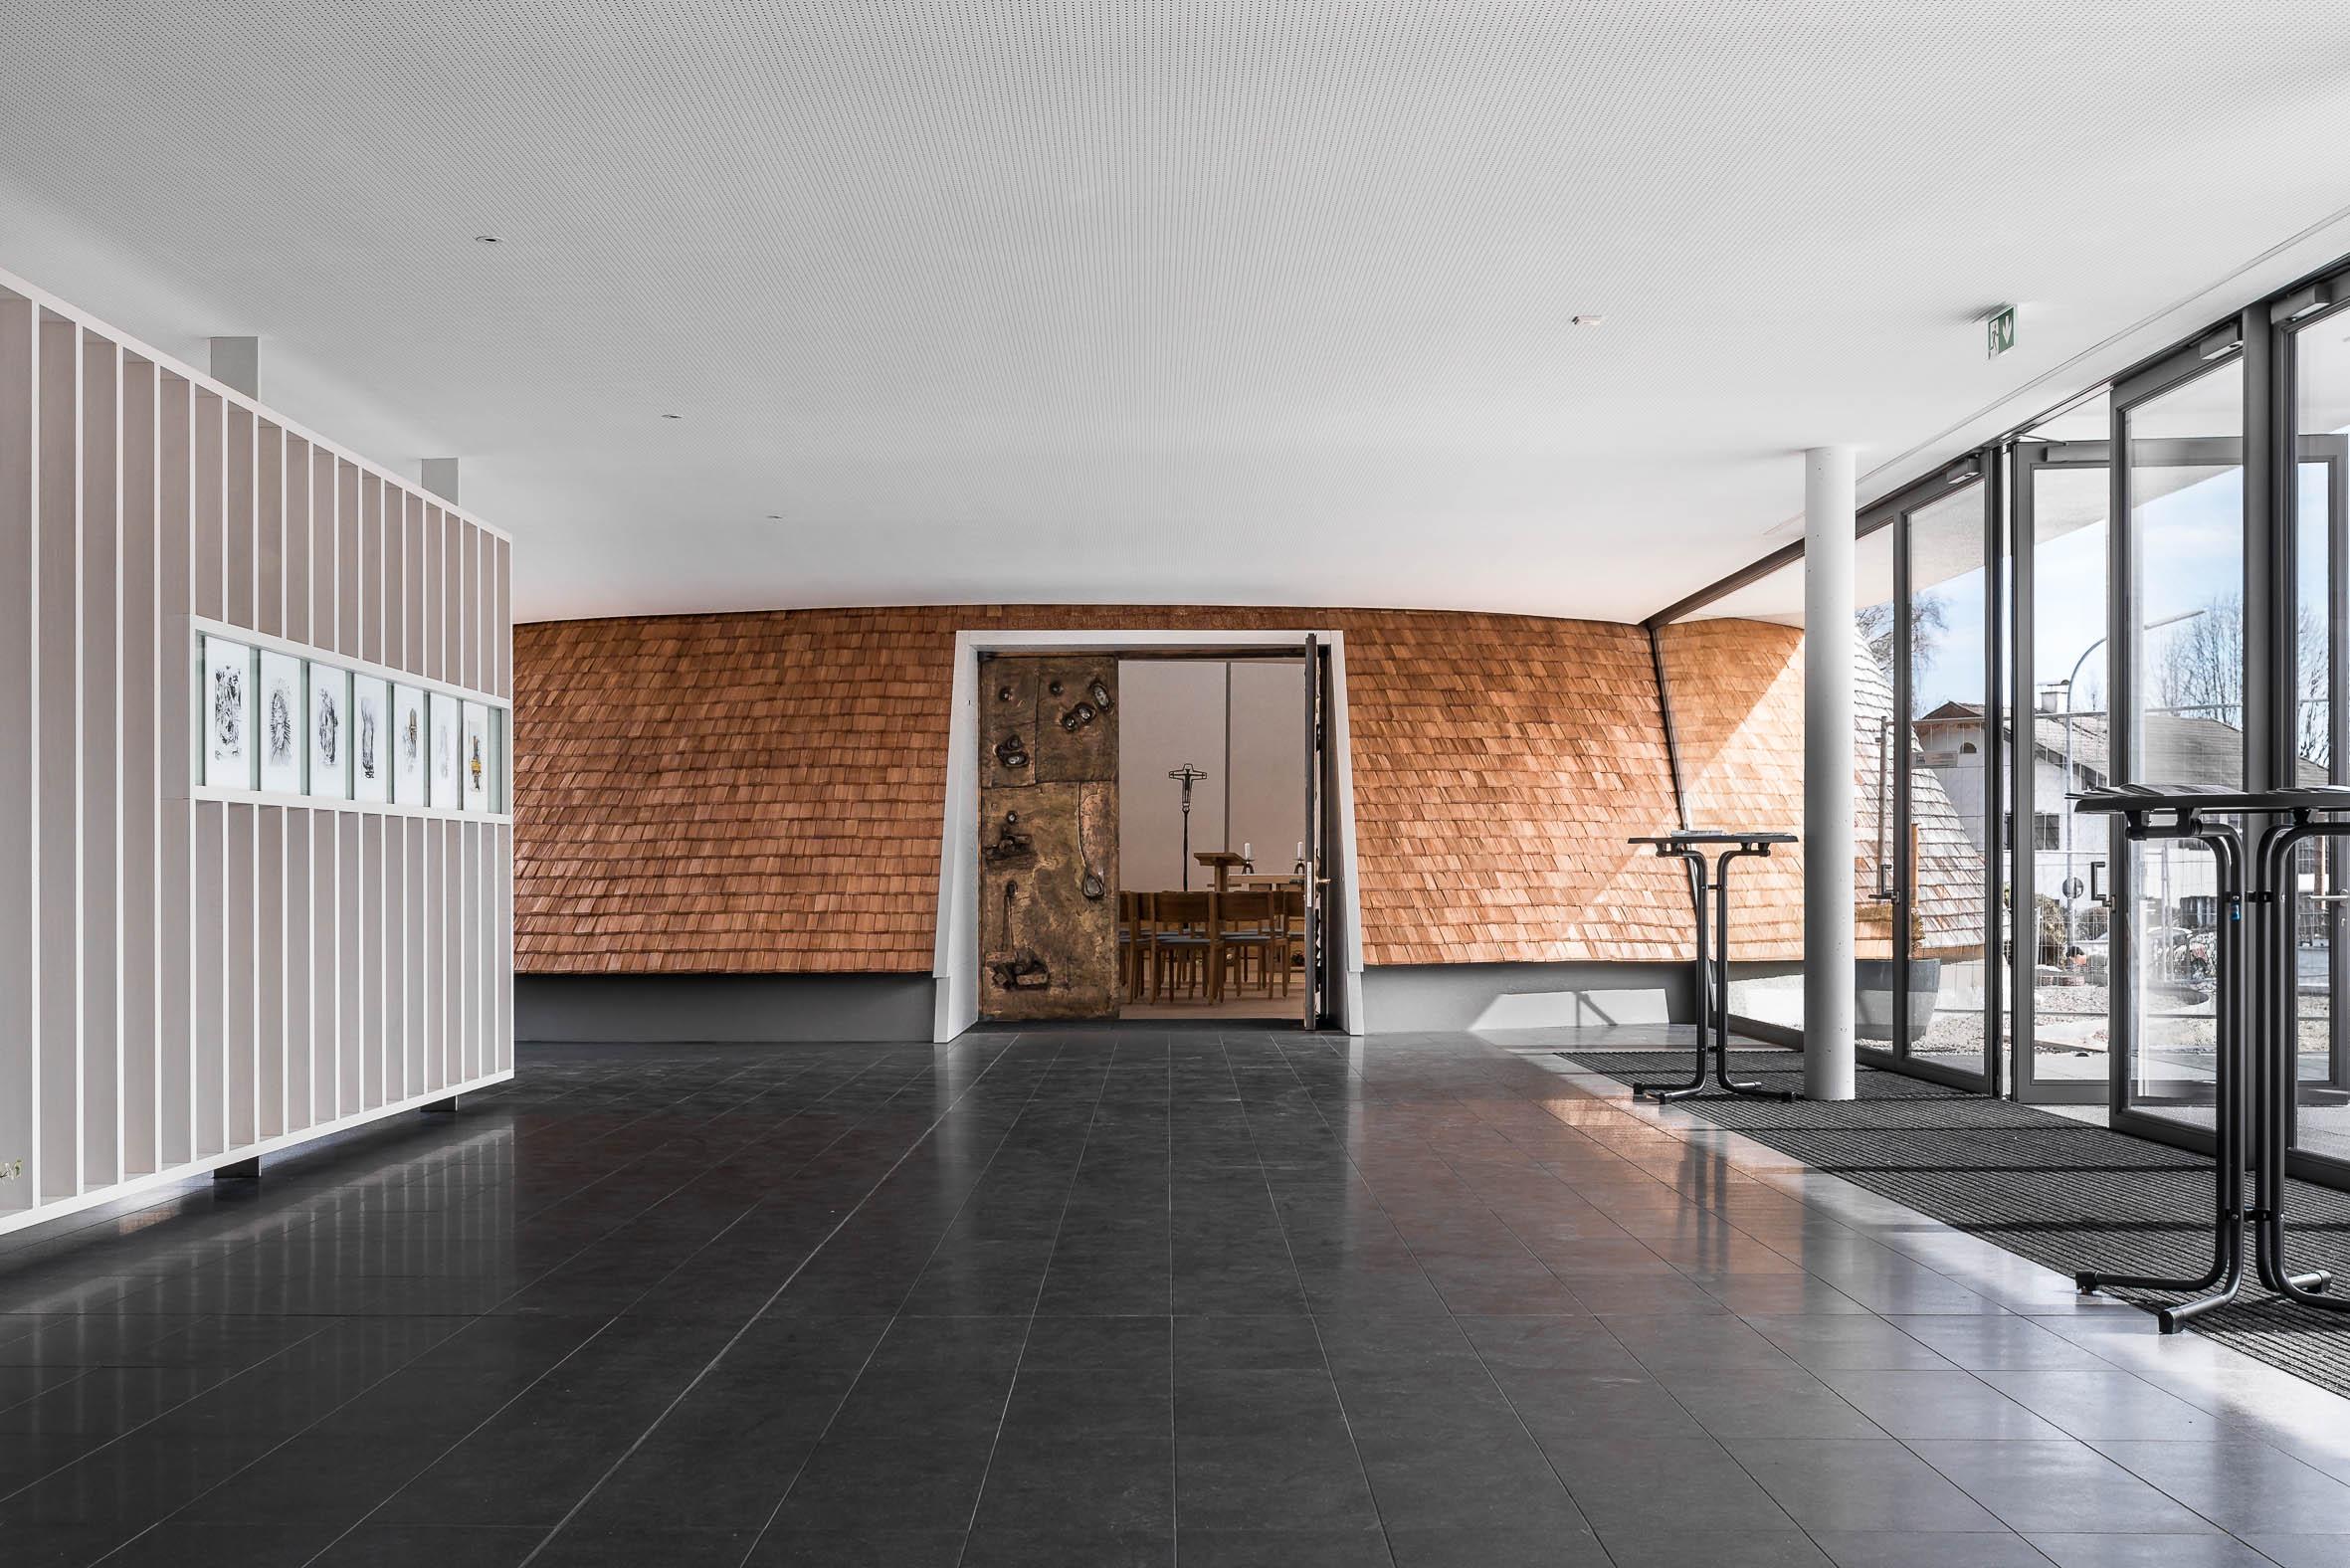 holzkirchen-kirche-st-josef-low-4194